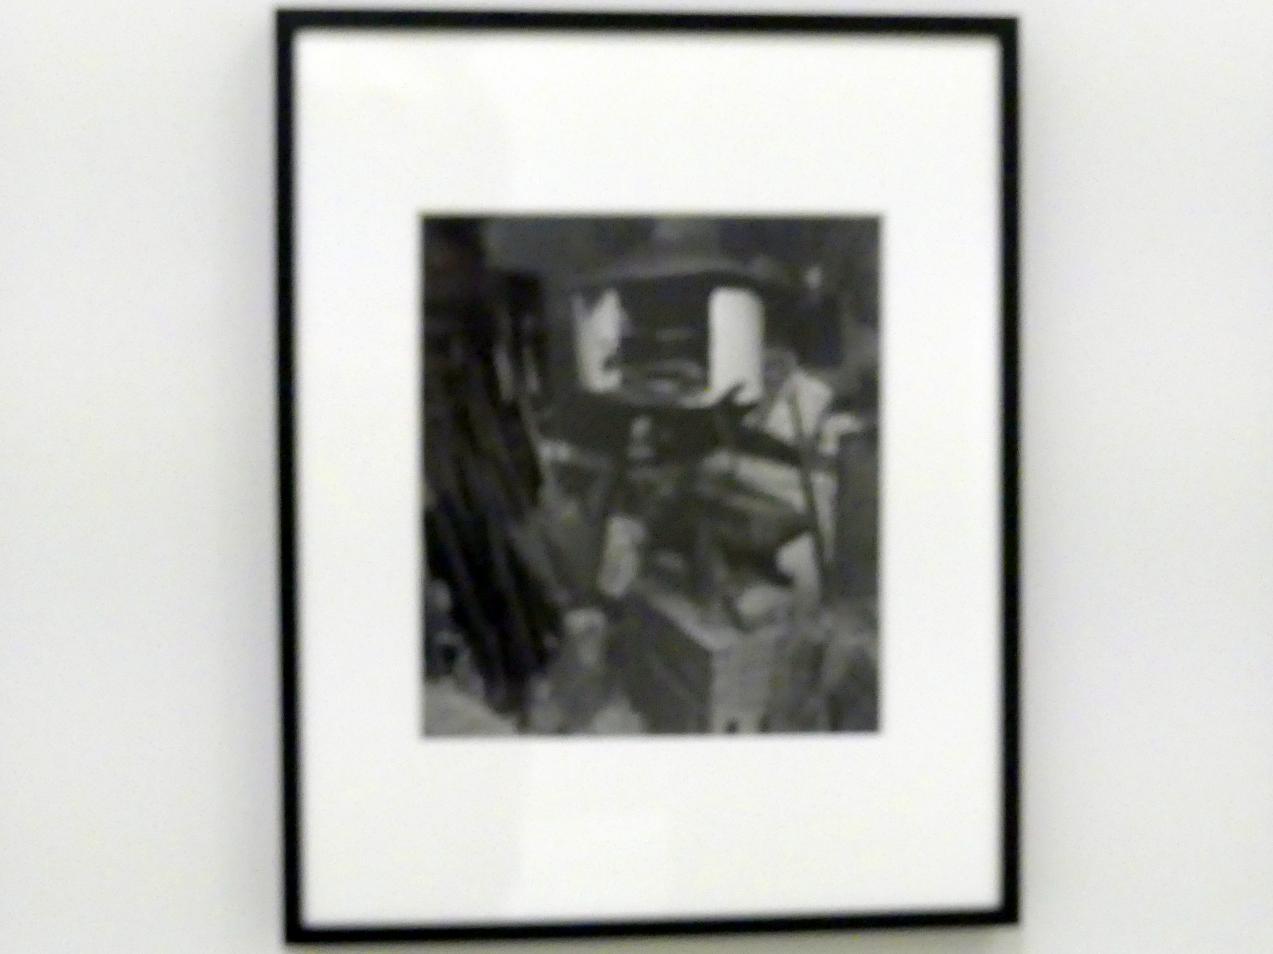 Wayne F. Miller: Constantin Brancusi's studio, 1946